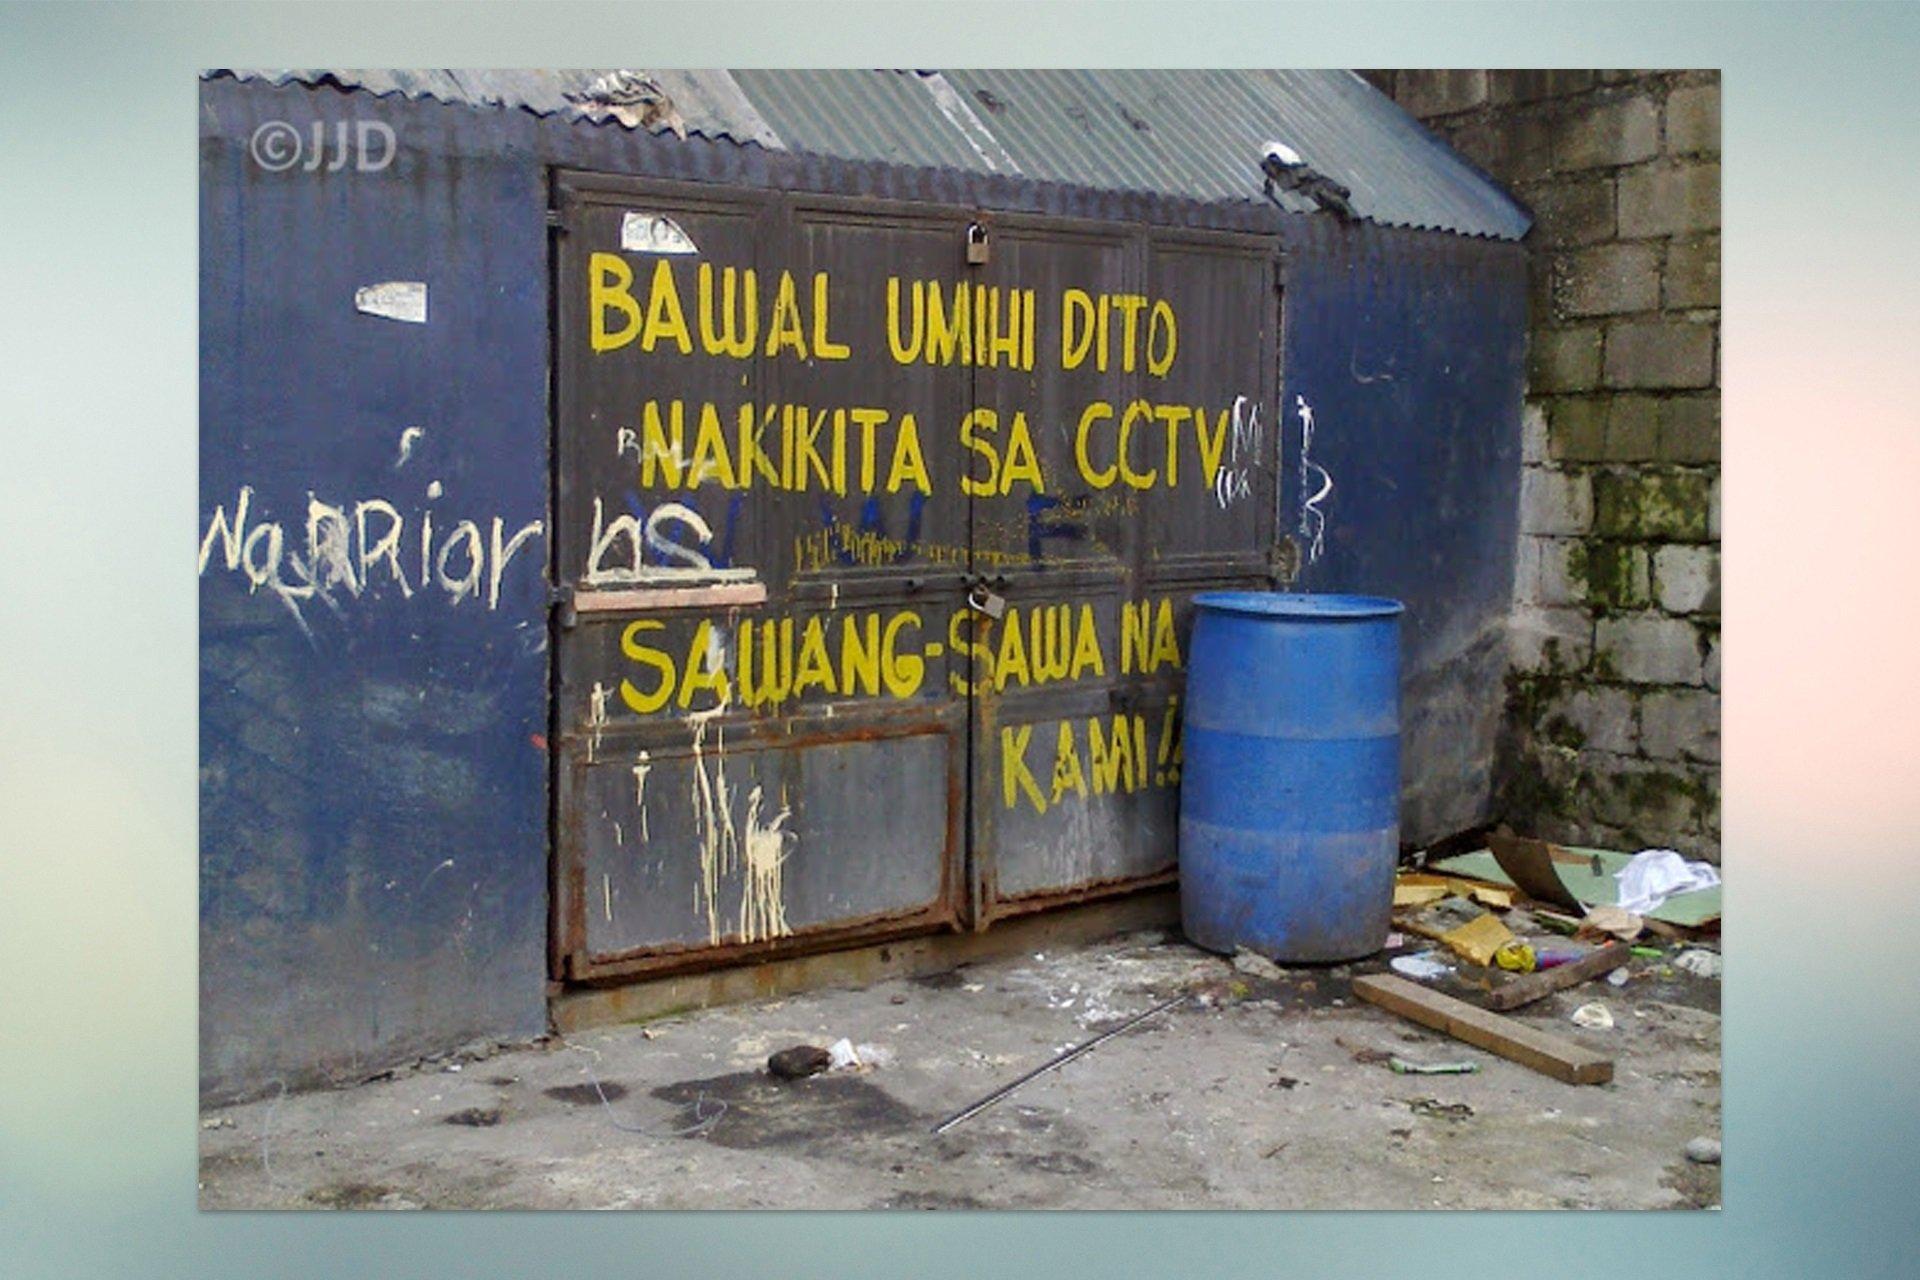 Funny Signages Bawal umihi